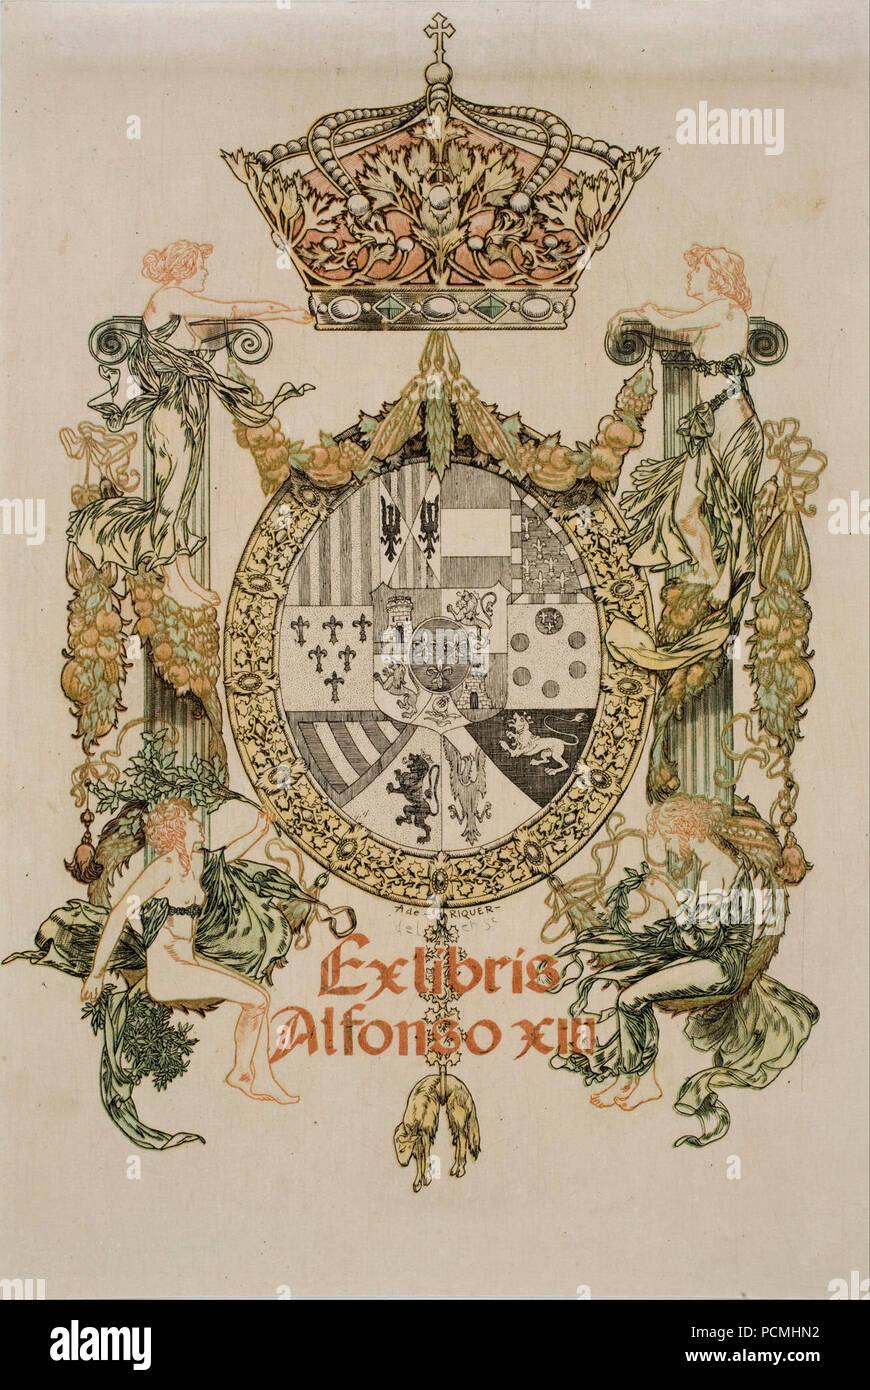 Alexandre de Riquer - Book-plate of Alfons XIII - - Stock Image